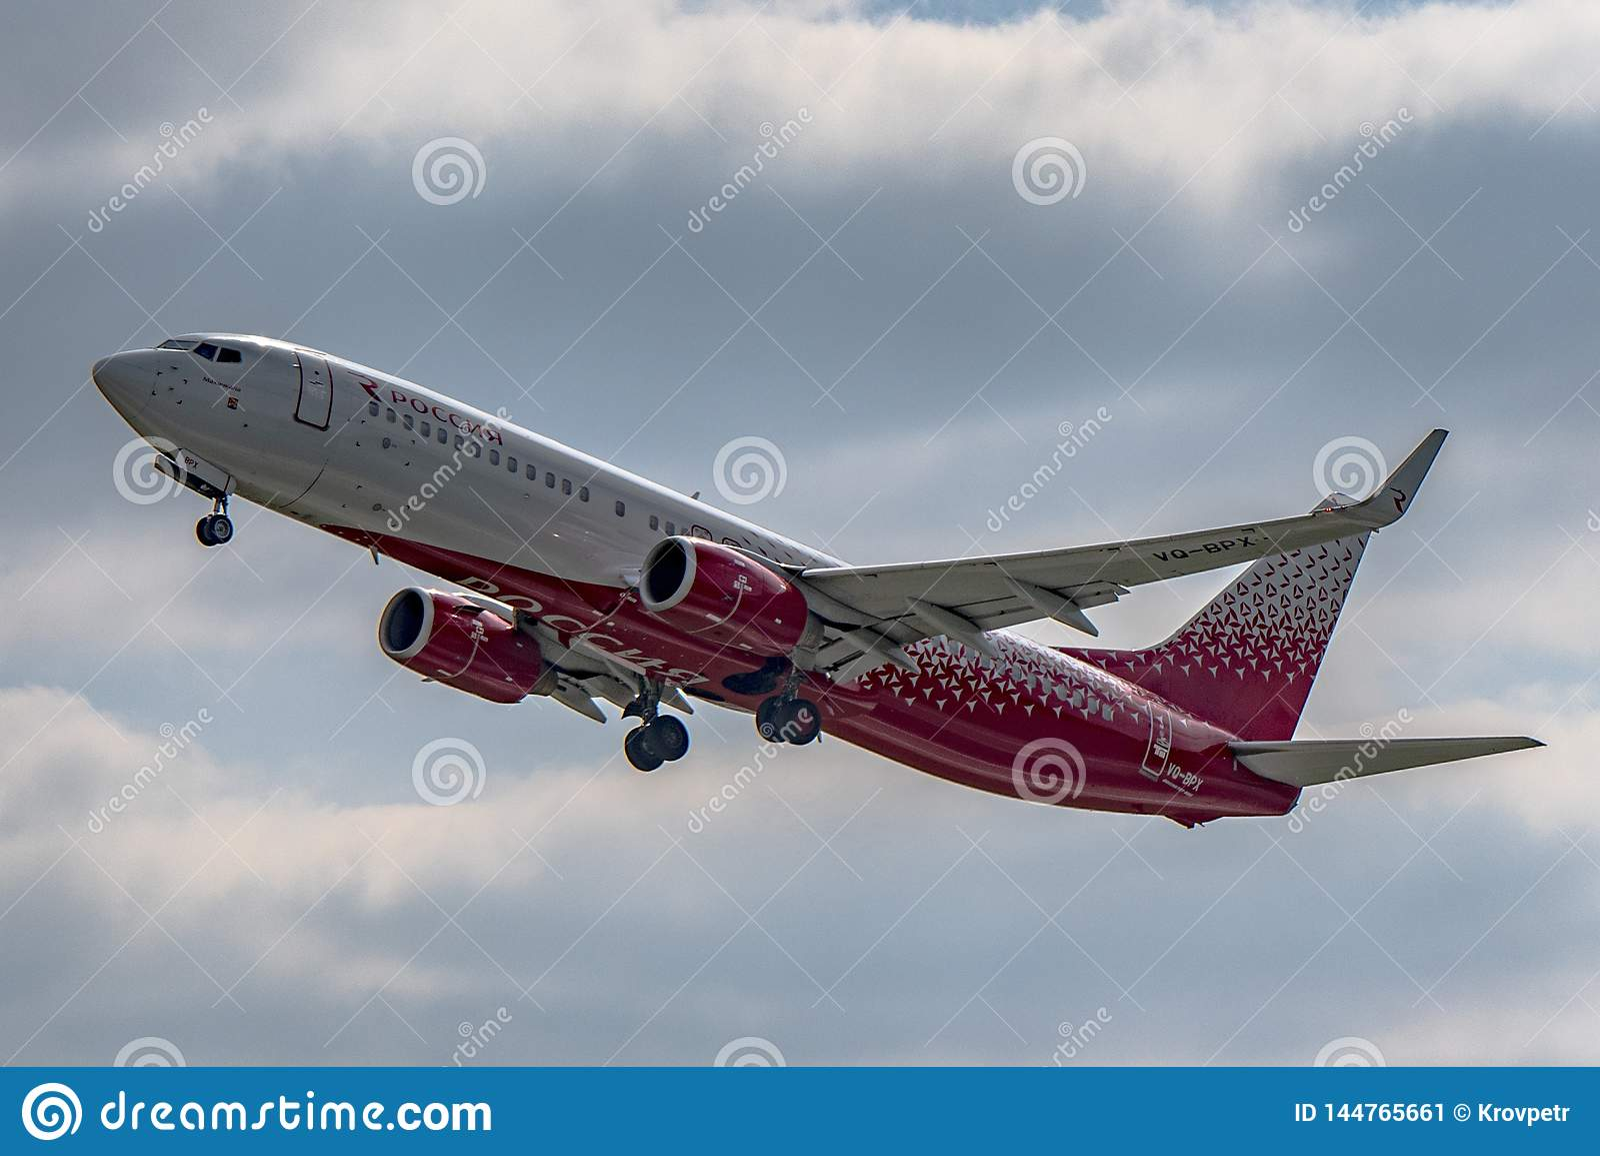 Flughafen Prag Ruzyne, entfernen Boeing 737-800 Russland